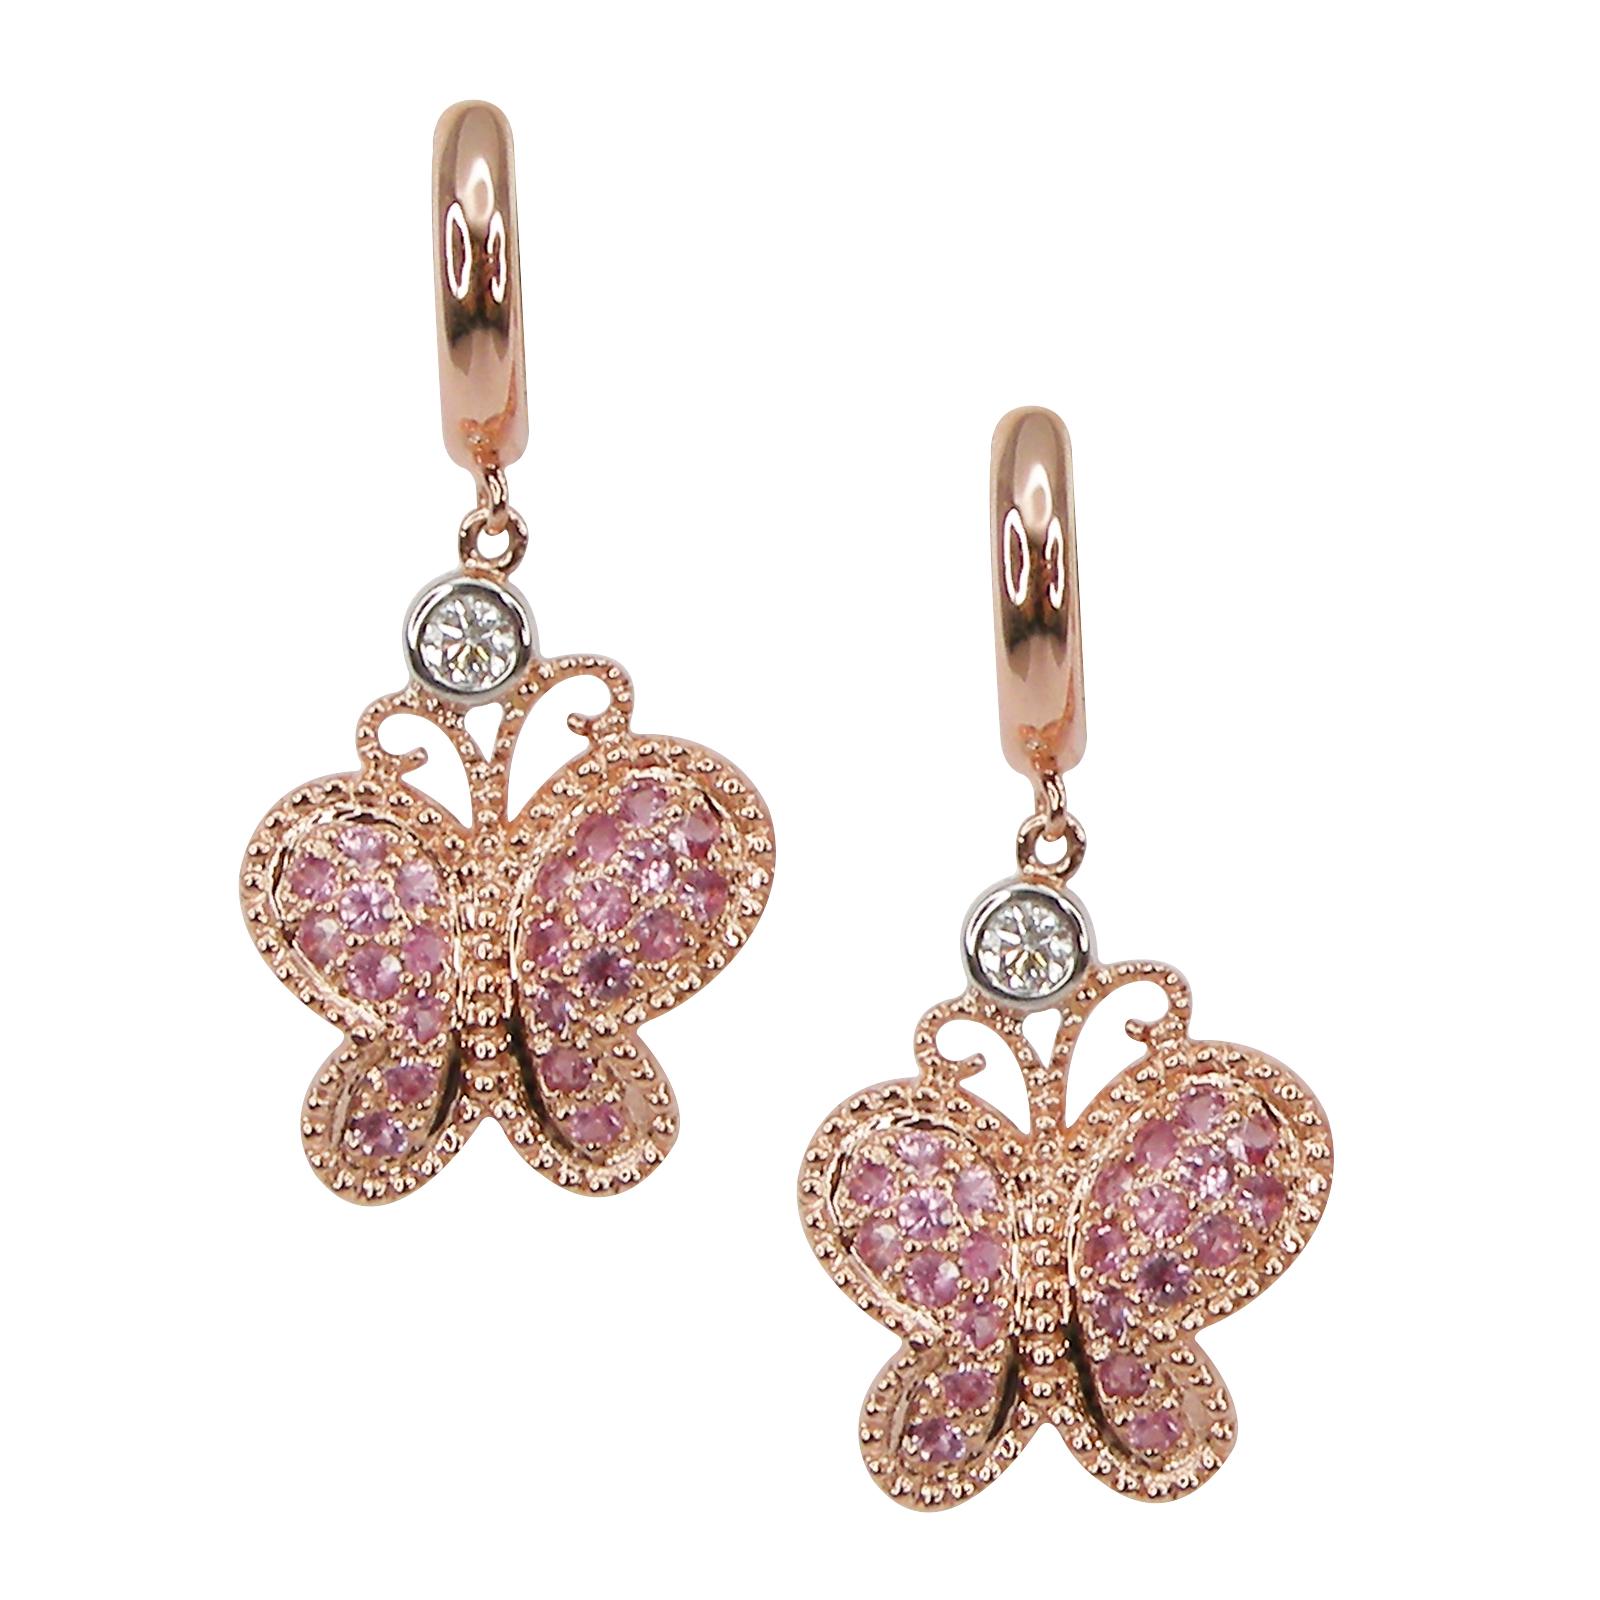 SIGNATURE PINK SAPPHIRE BUTTERFLY EARRINGS CLUSTER DIAMOND PENDANT BESPOKE FINE JEWELLERY BY SHAHINA HATTA